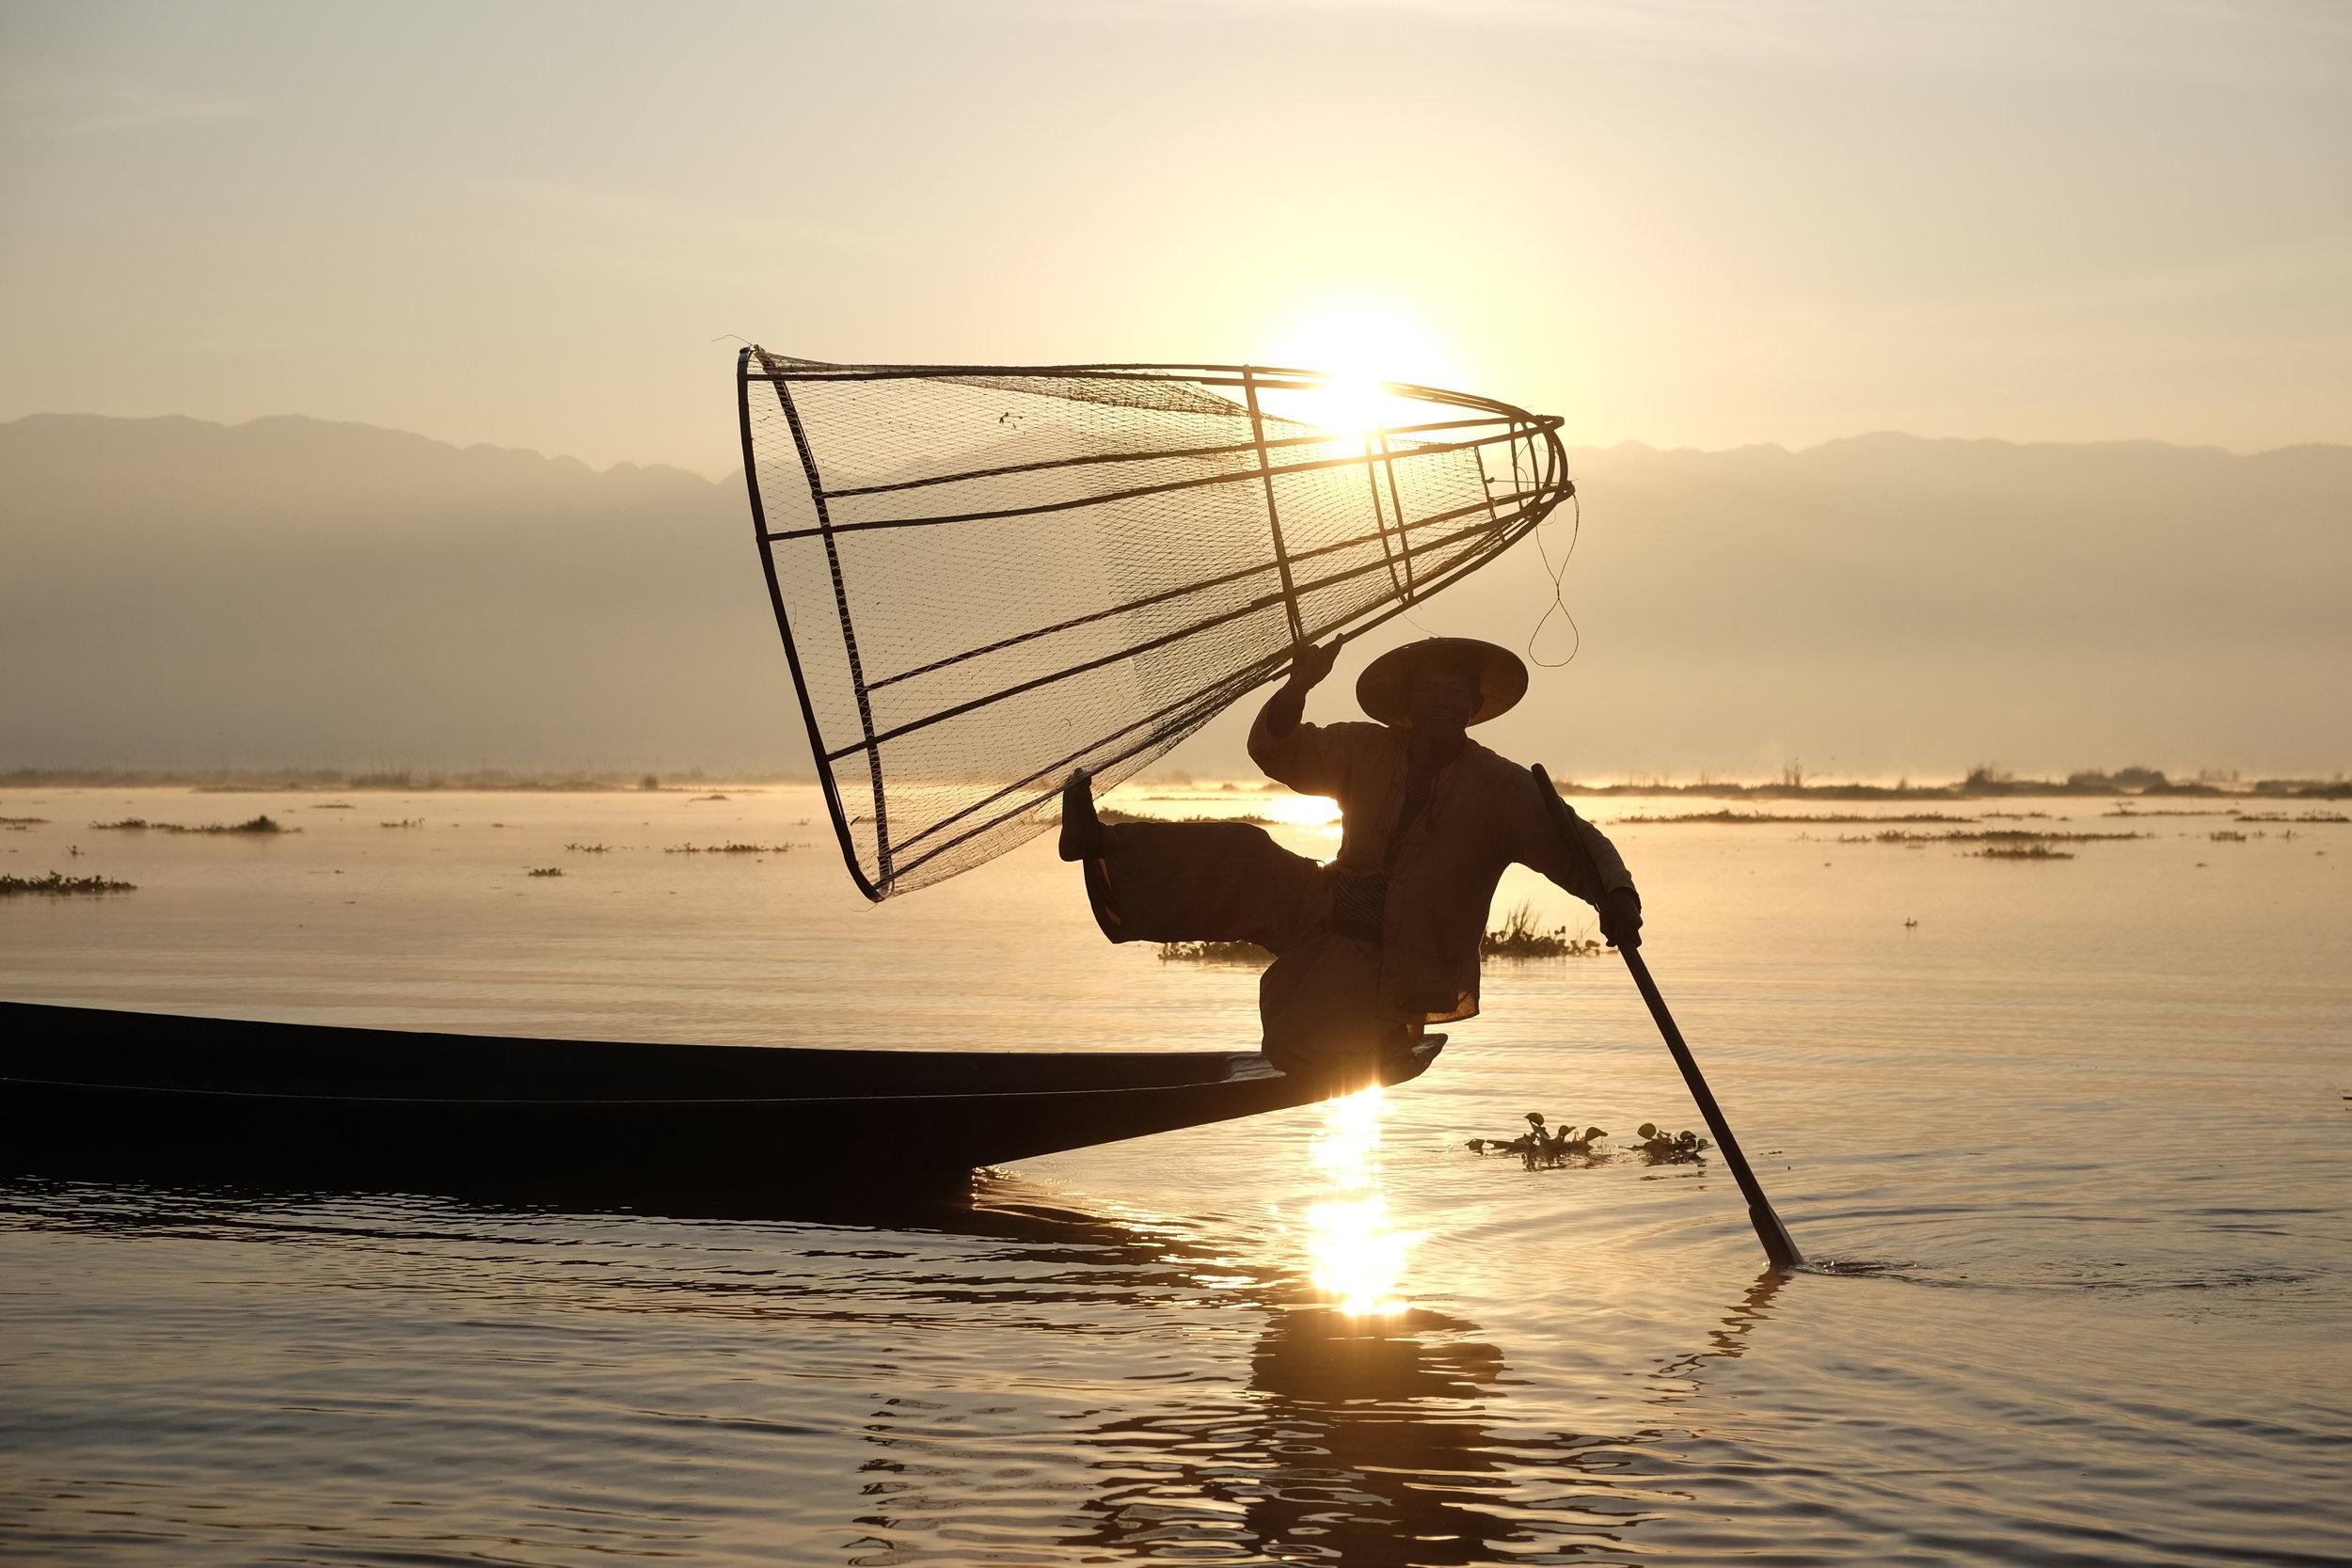 Inle Lake fisherman lifting his net at sunrise